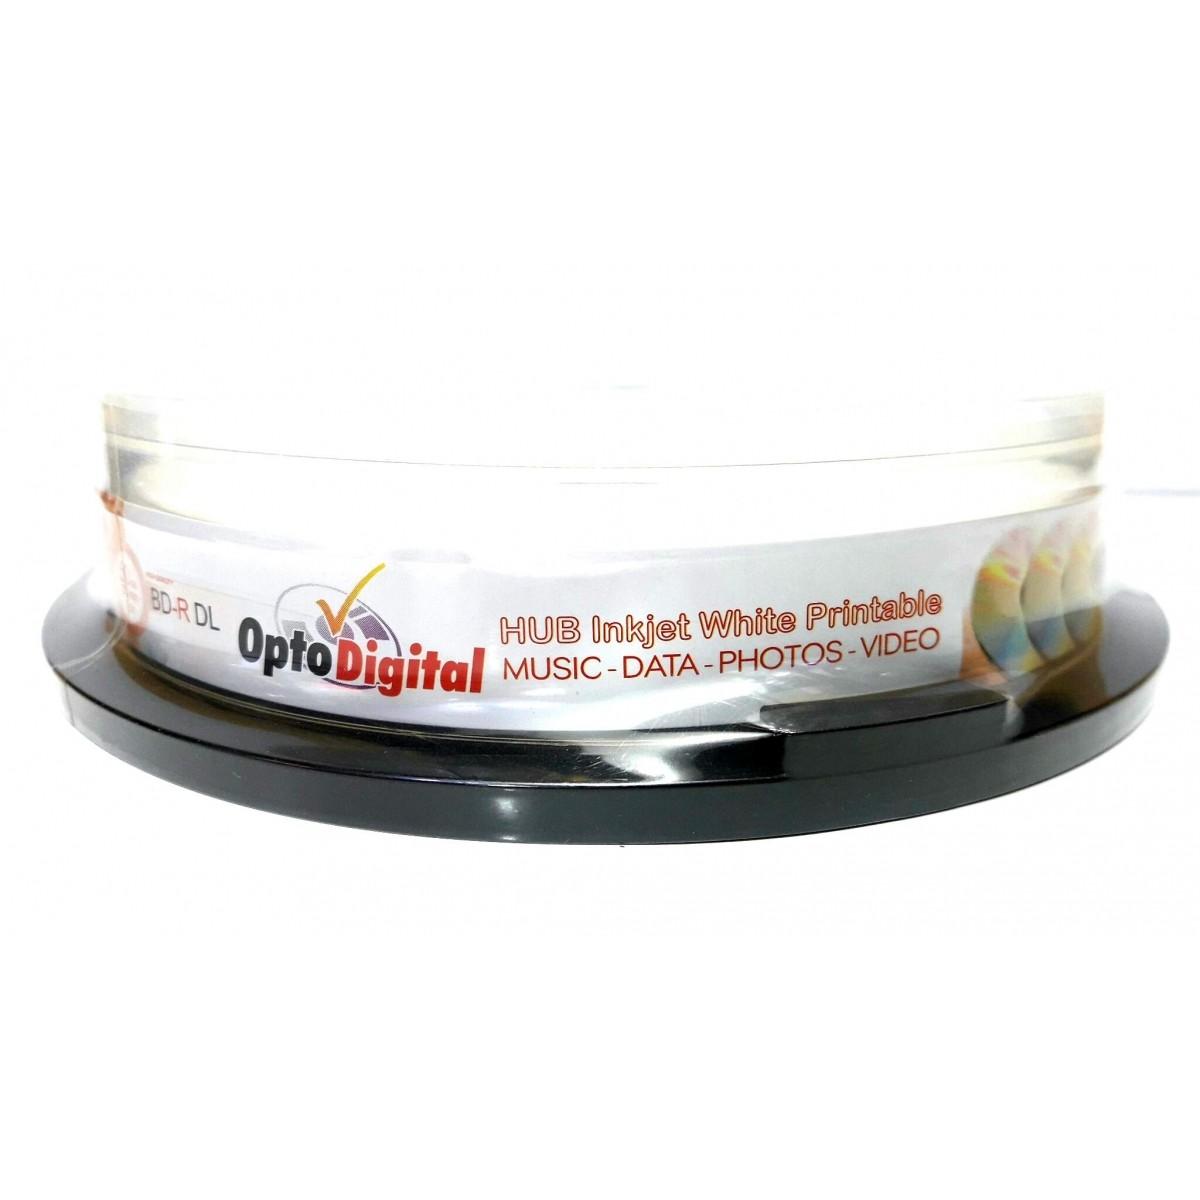 10 Mídia Virgem Bluray Bd-r Dual Layer Opto Digital Printable 50gb 270min